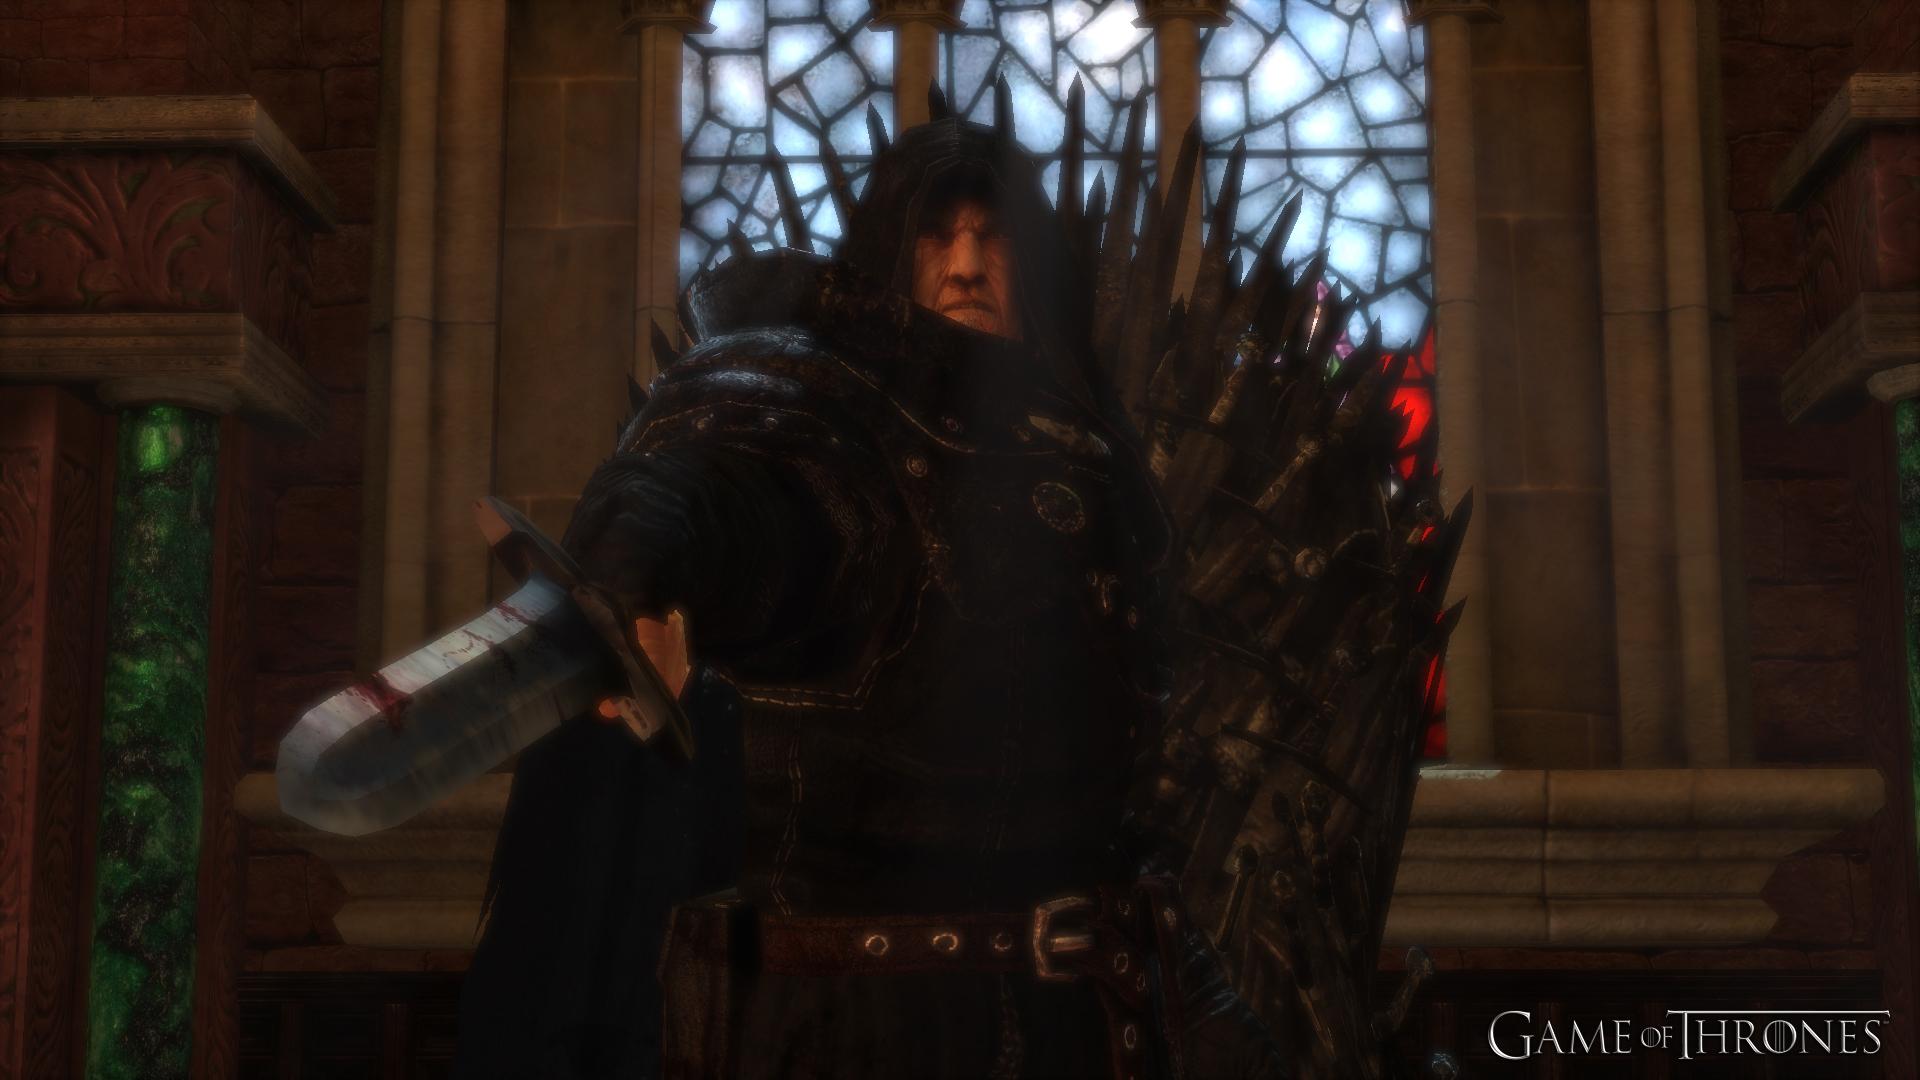 game_of_thrones-02.jpg